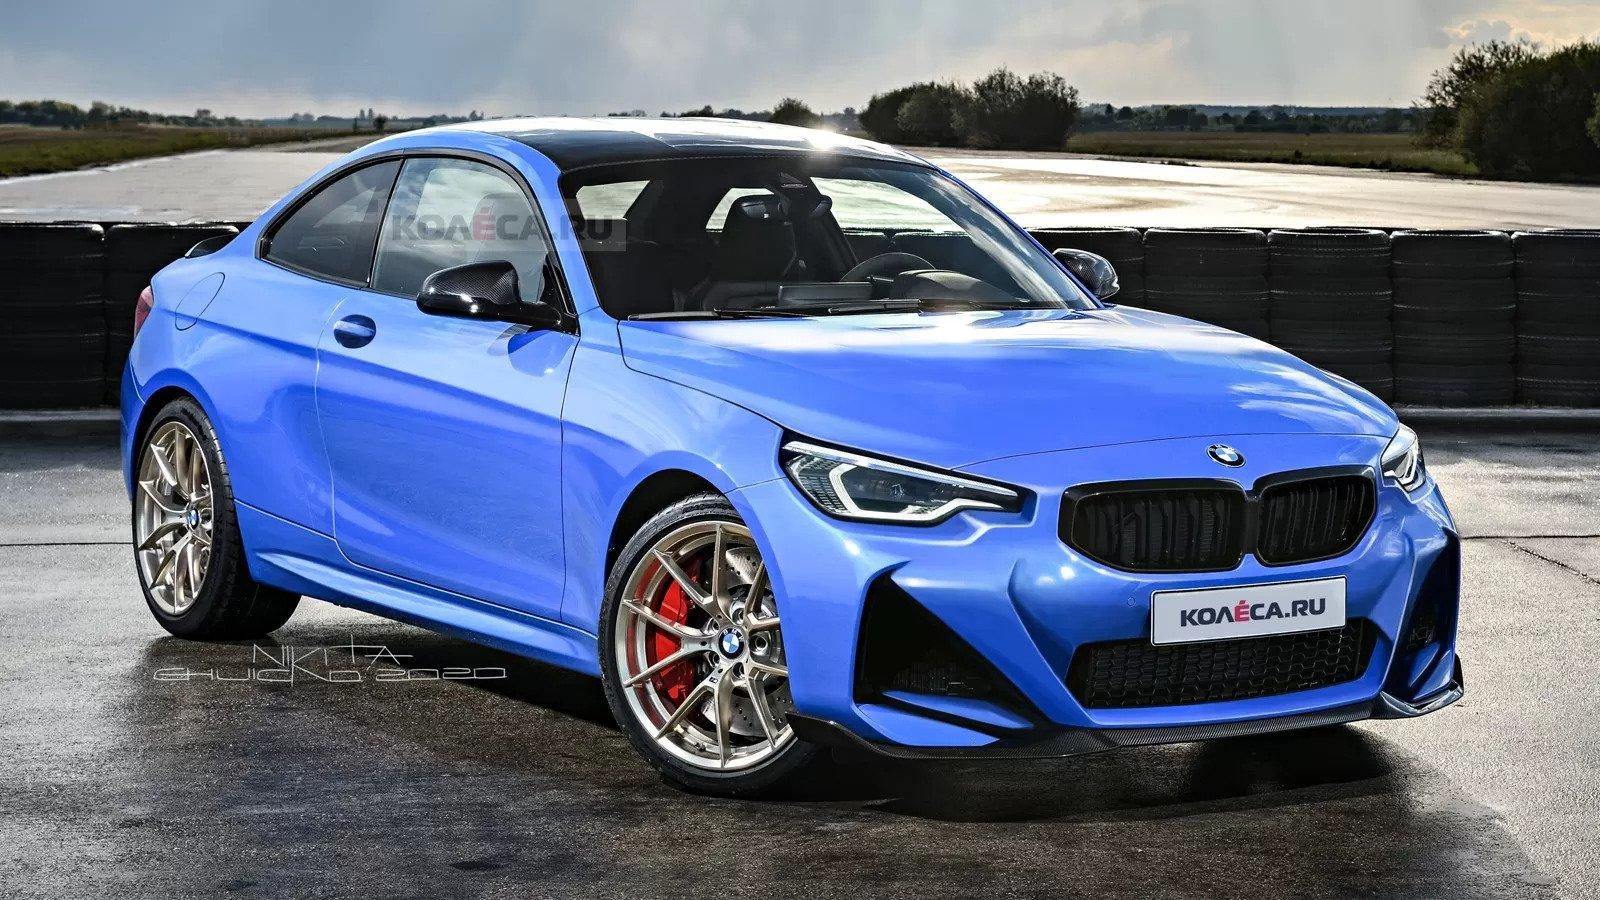 Nuova BMW M2 Coupé 2021, design in Anteprima Rendering